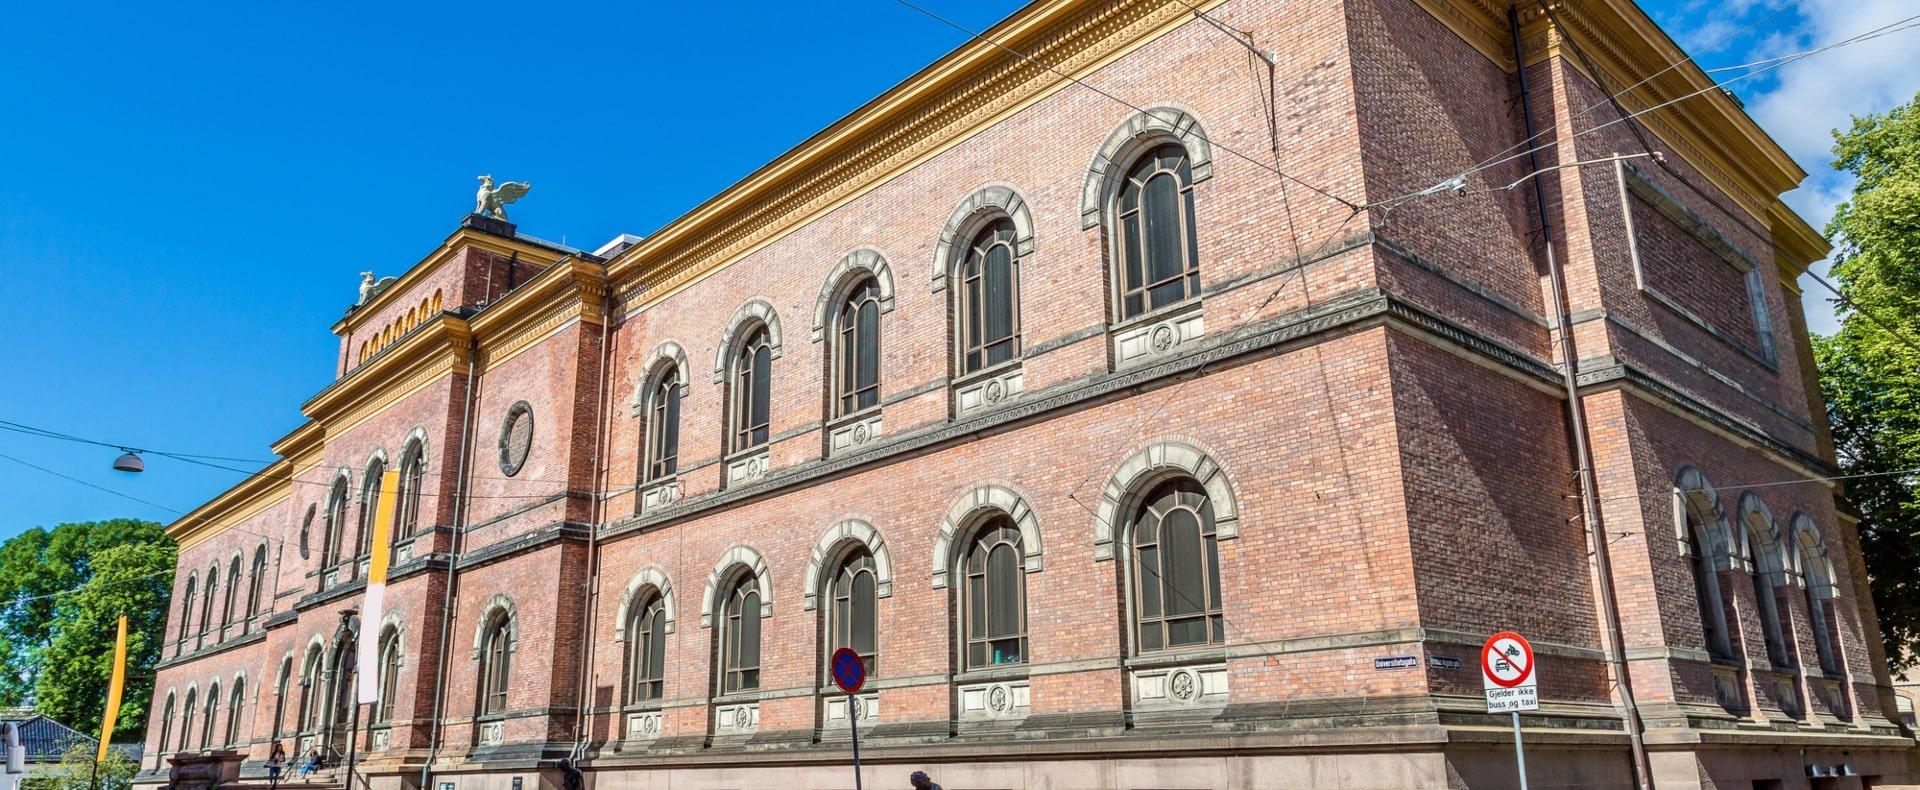 National Gallery, Oslo, Norway